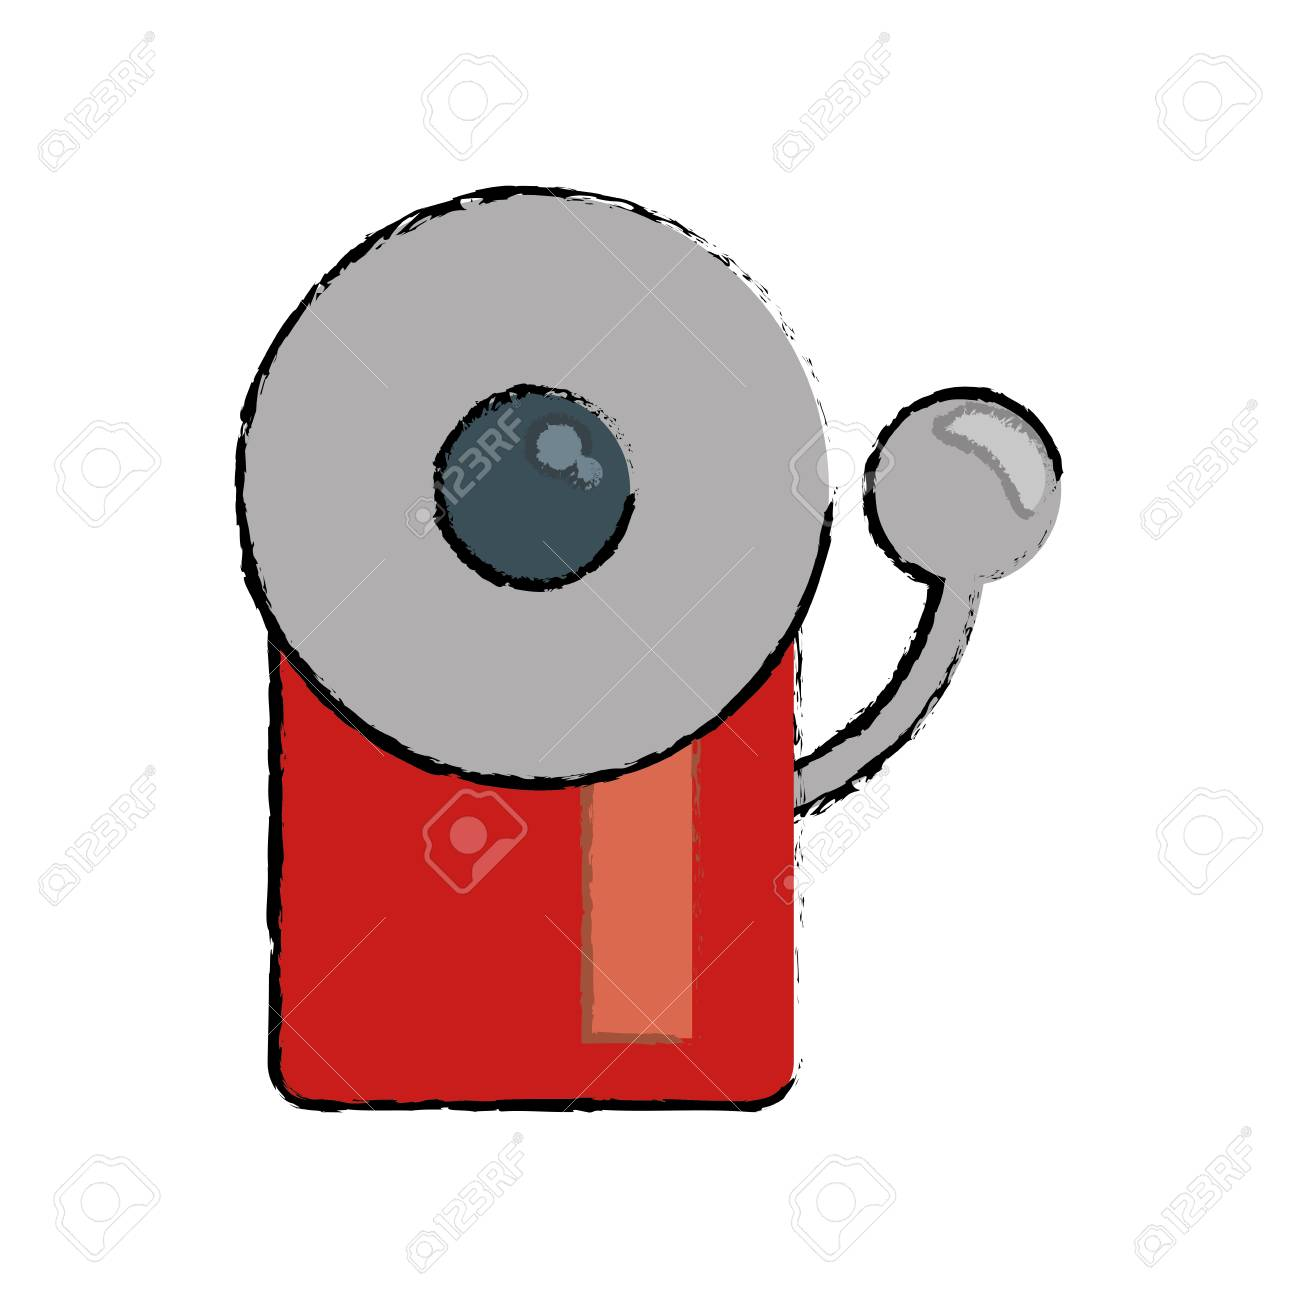 1300x1300 Drawing Alarm Fire Emergency Alert Icon Vector Illustration Eps